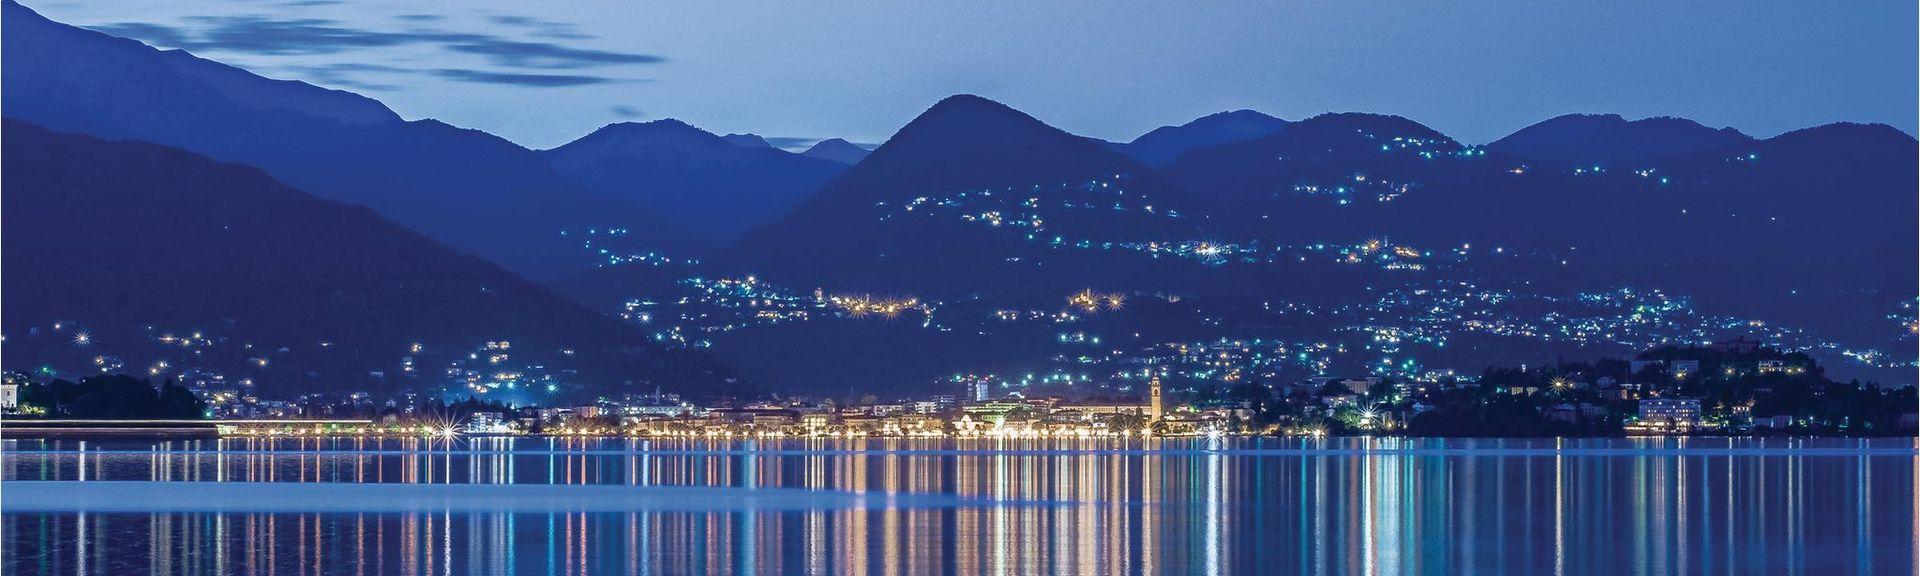 Sesto Calende, Lombardia, Itália